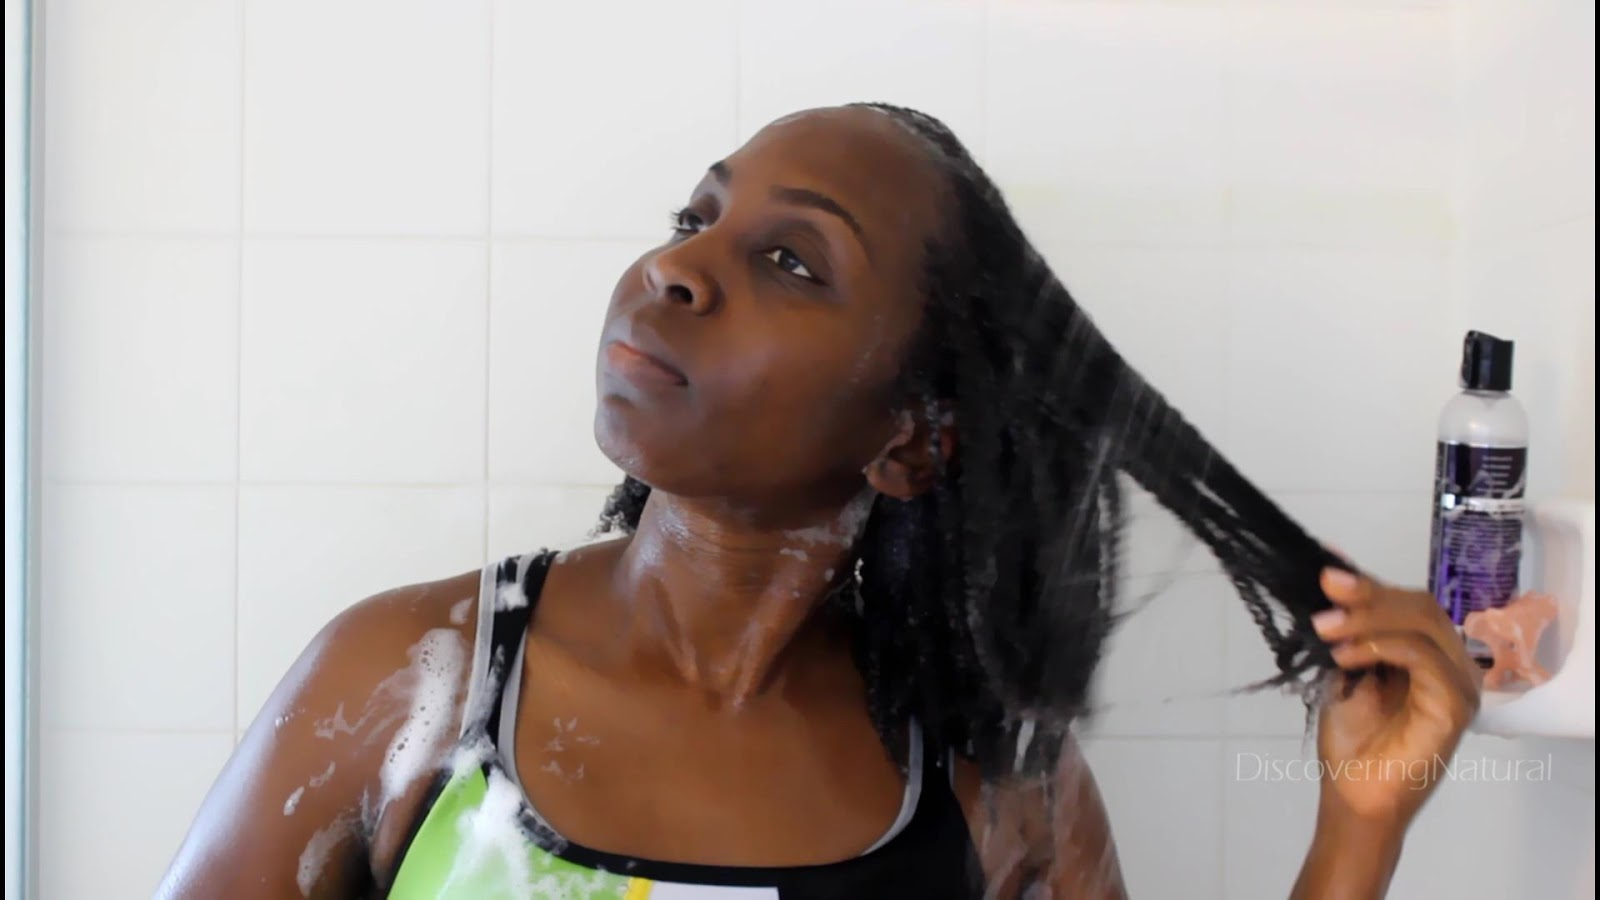 Discoveringnatural Natural Hair Wash Day Routine Using